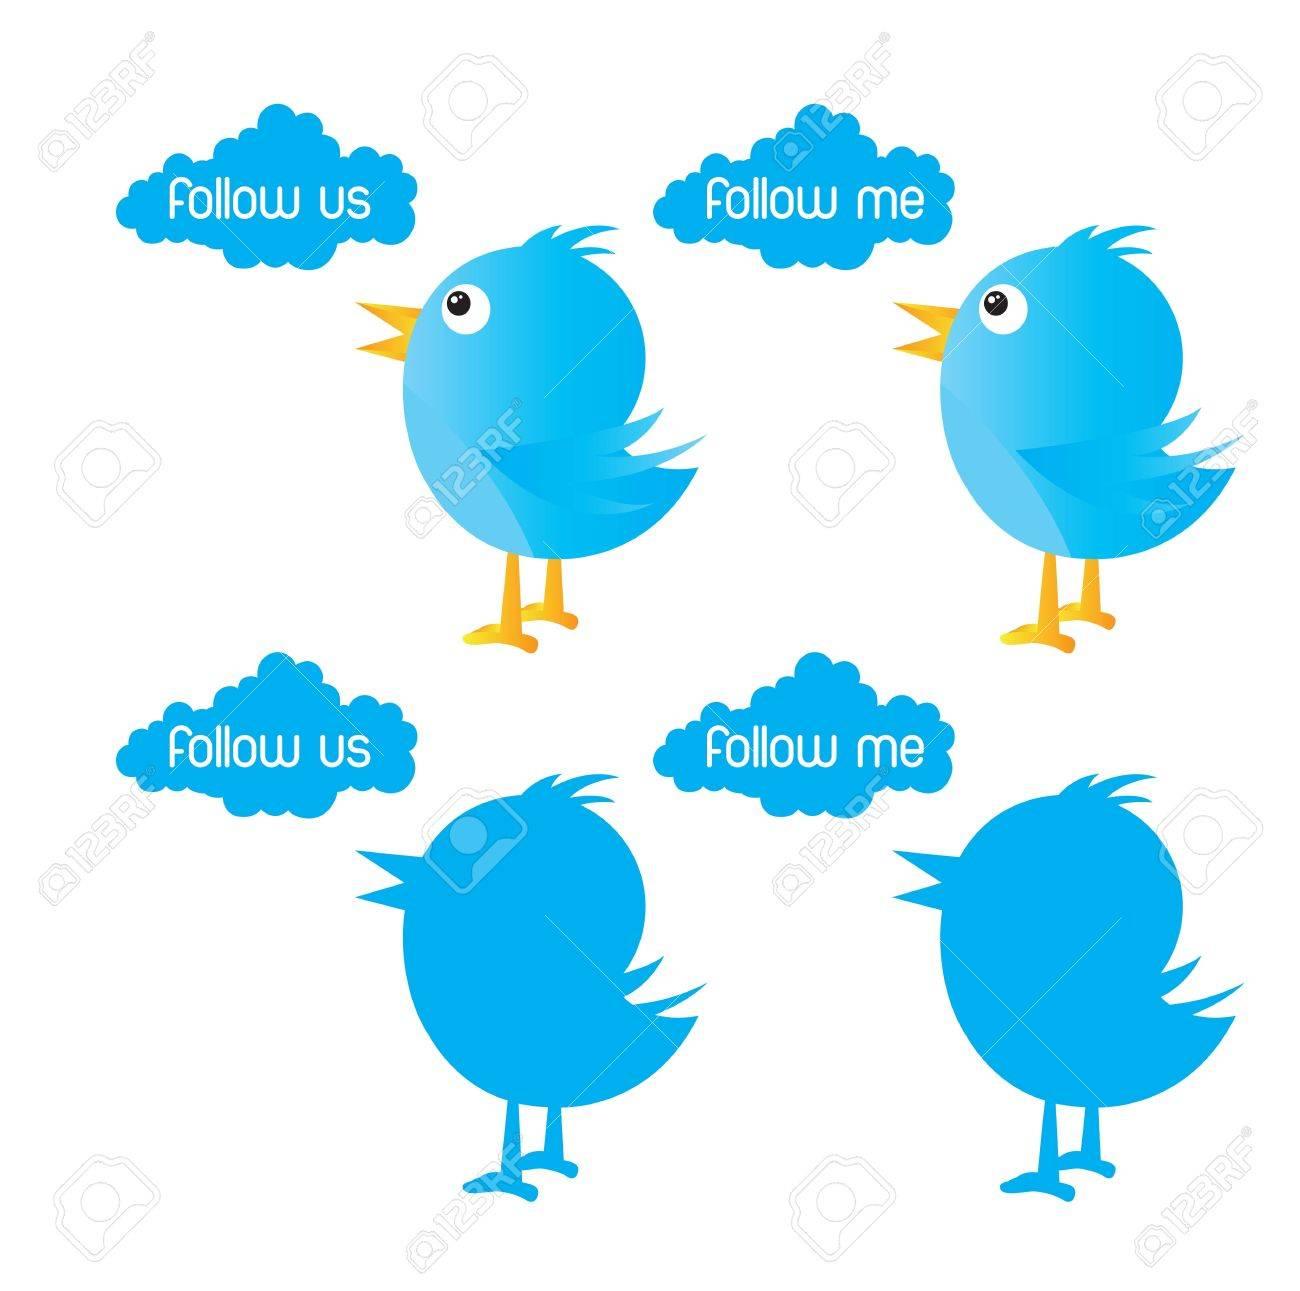 bird symbol inviting follow over white background Stock Vector - 14792783